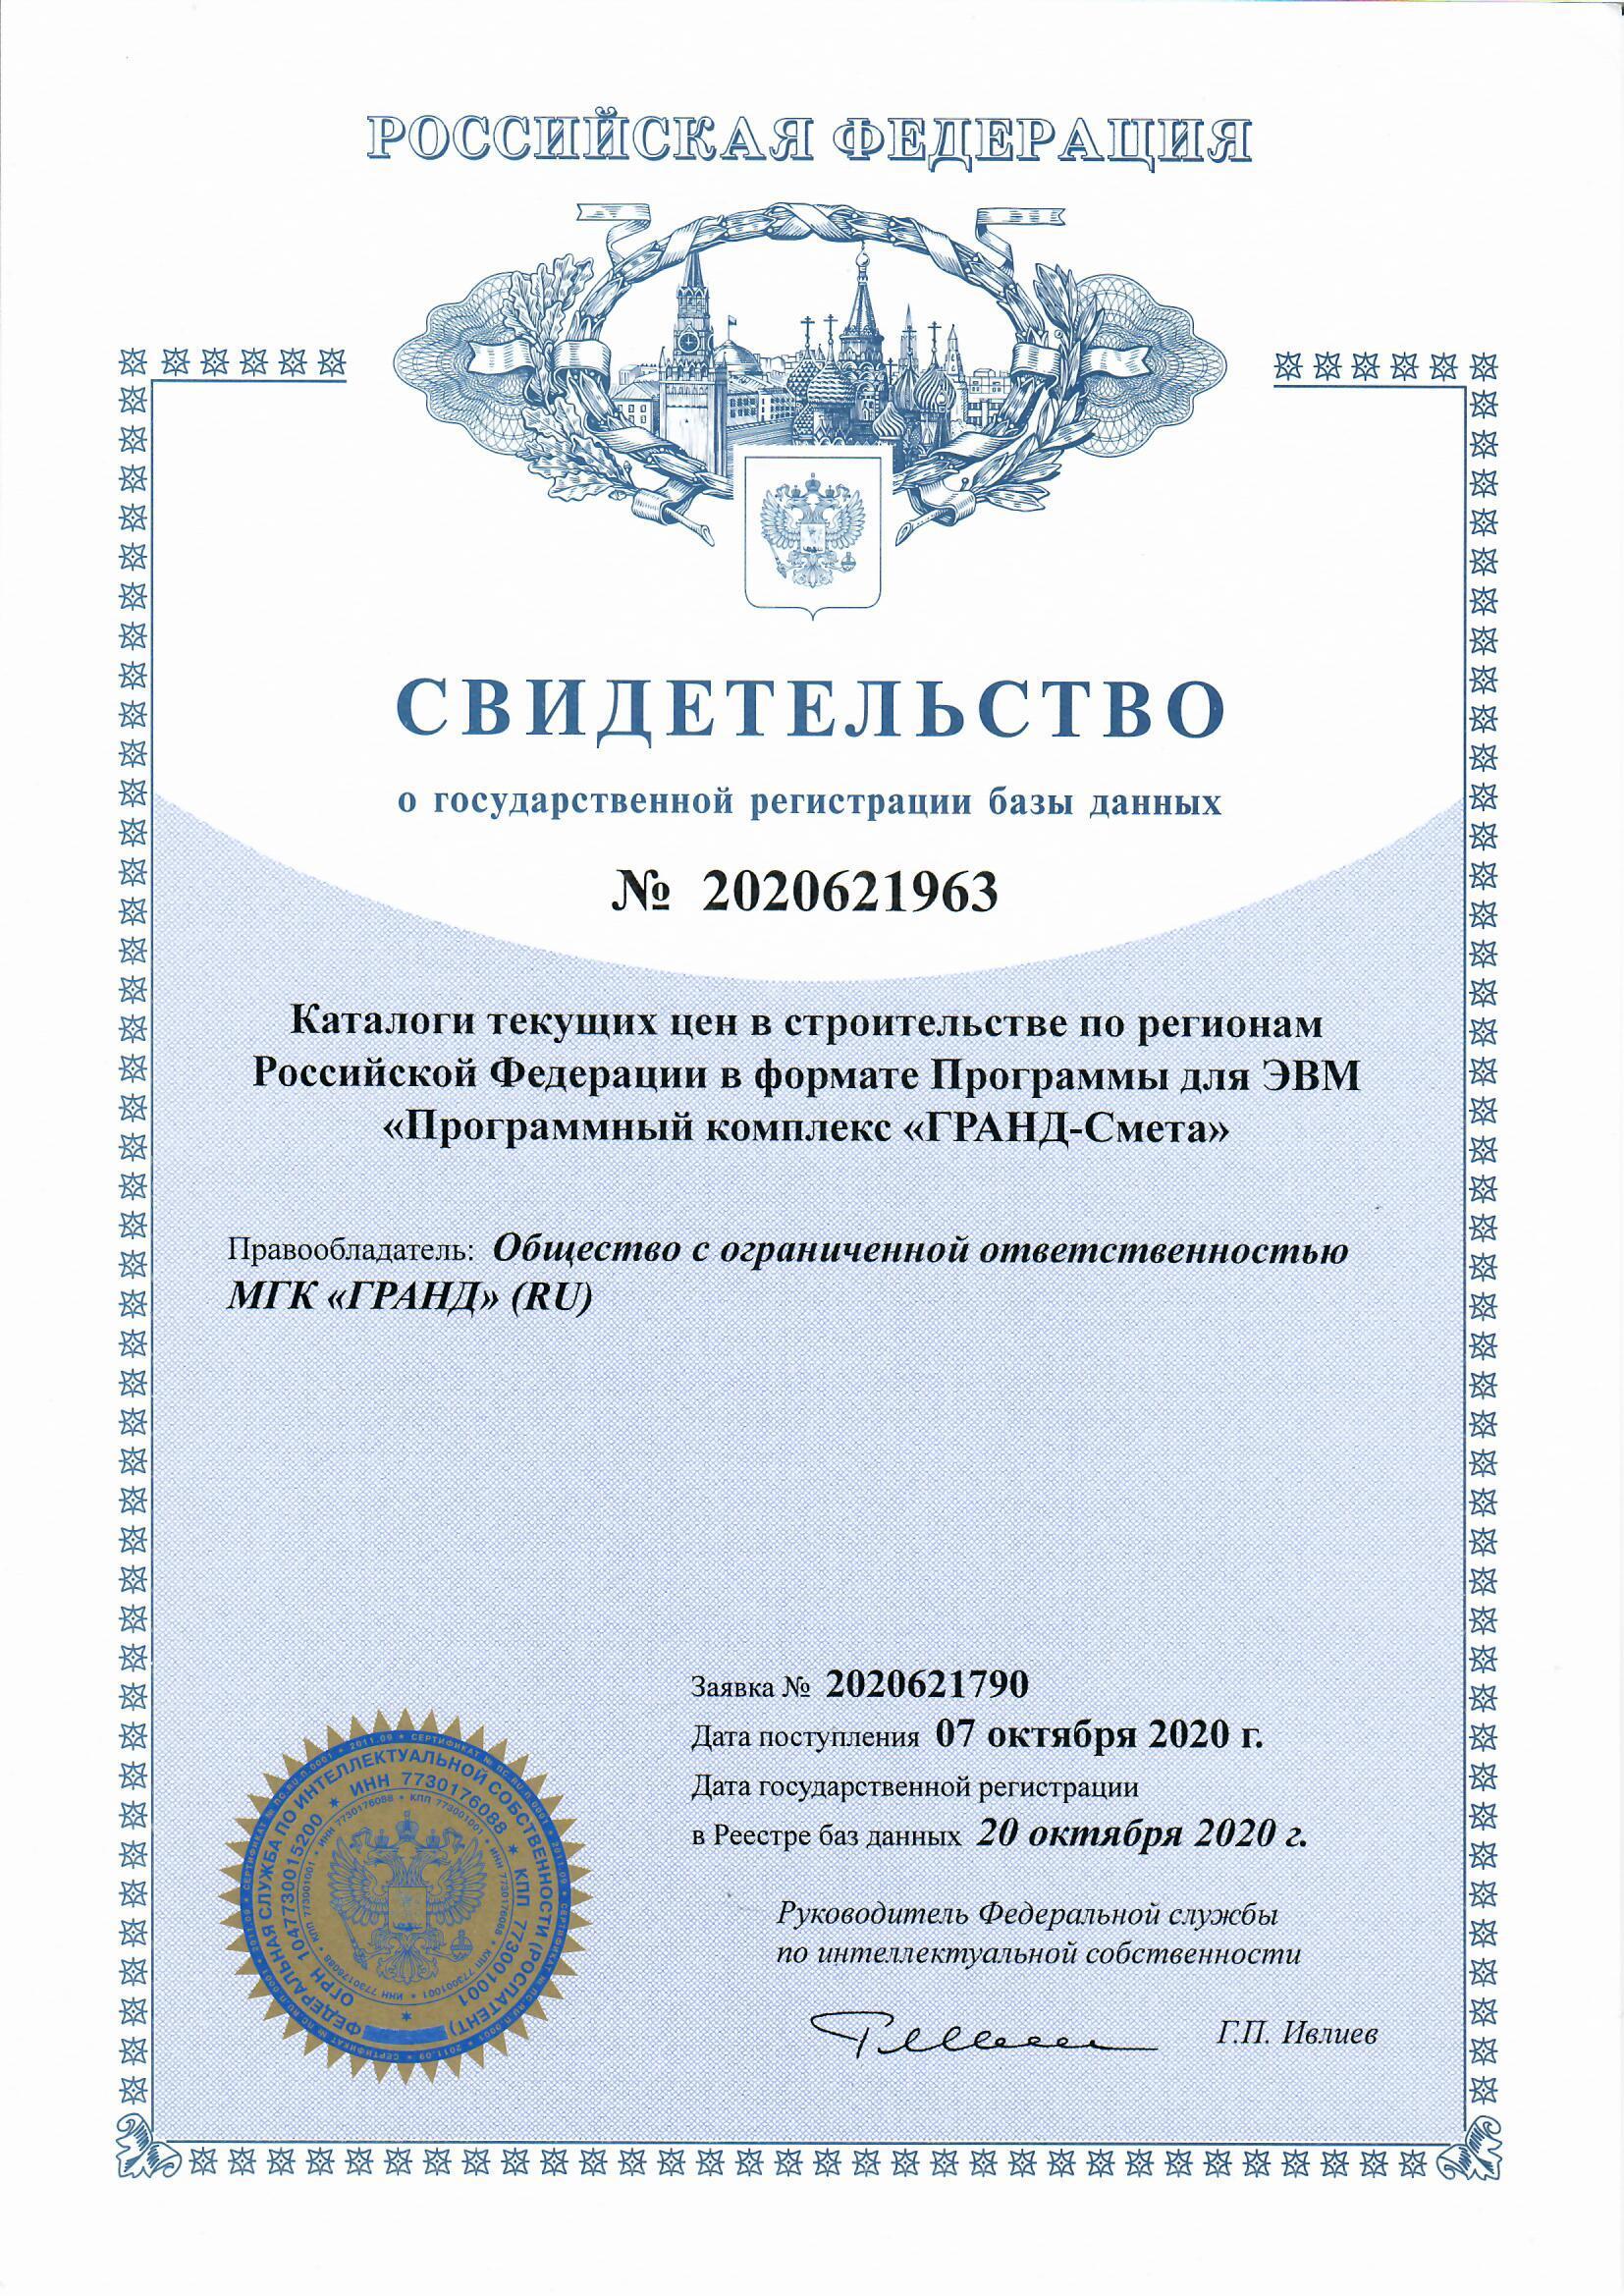 Каталоги текущих цен в строительстве по субъектам РФ